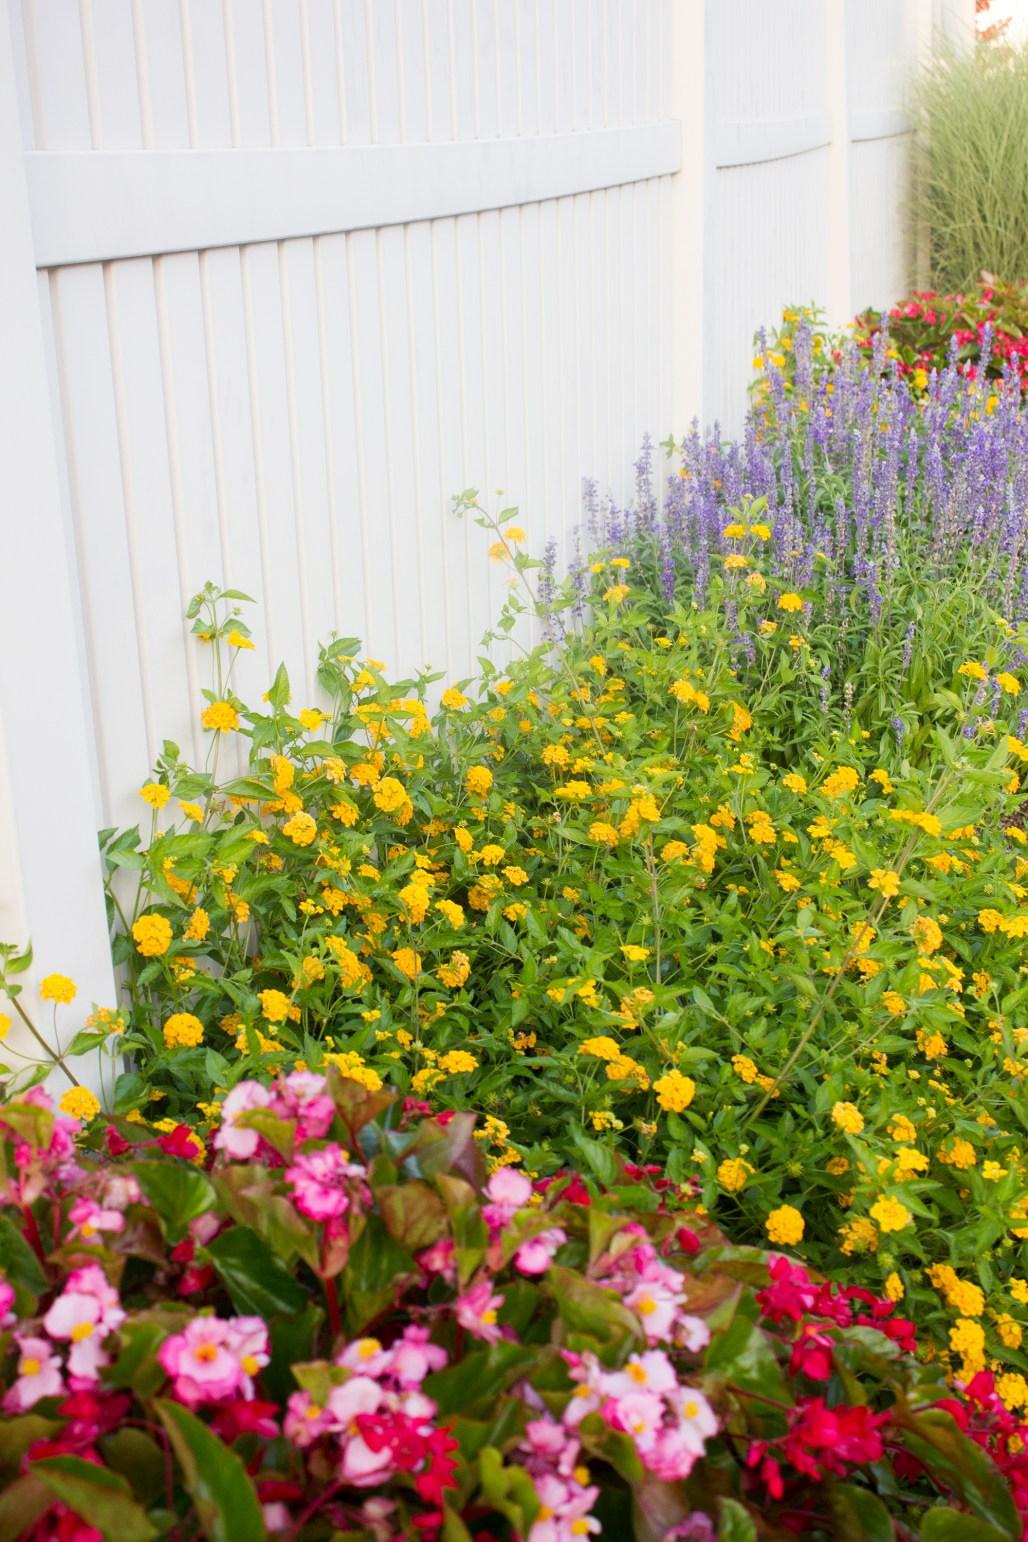 historic-delaware-flowers-gate-lewes